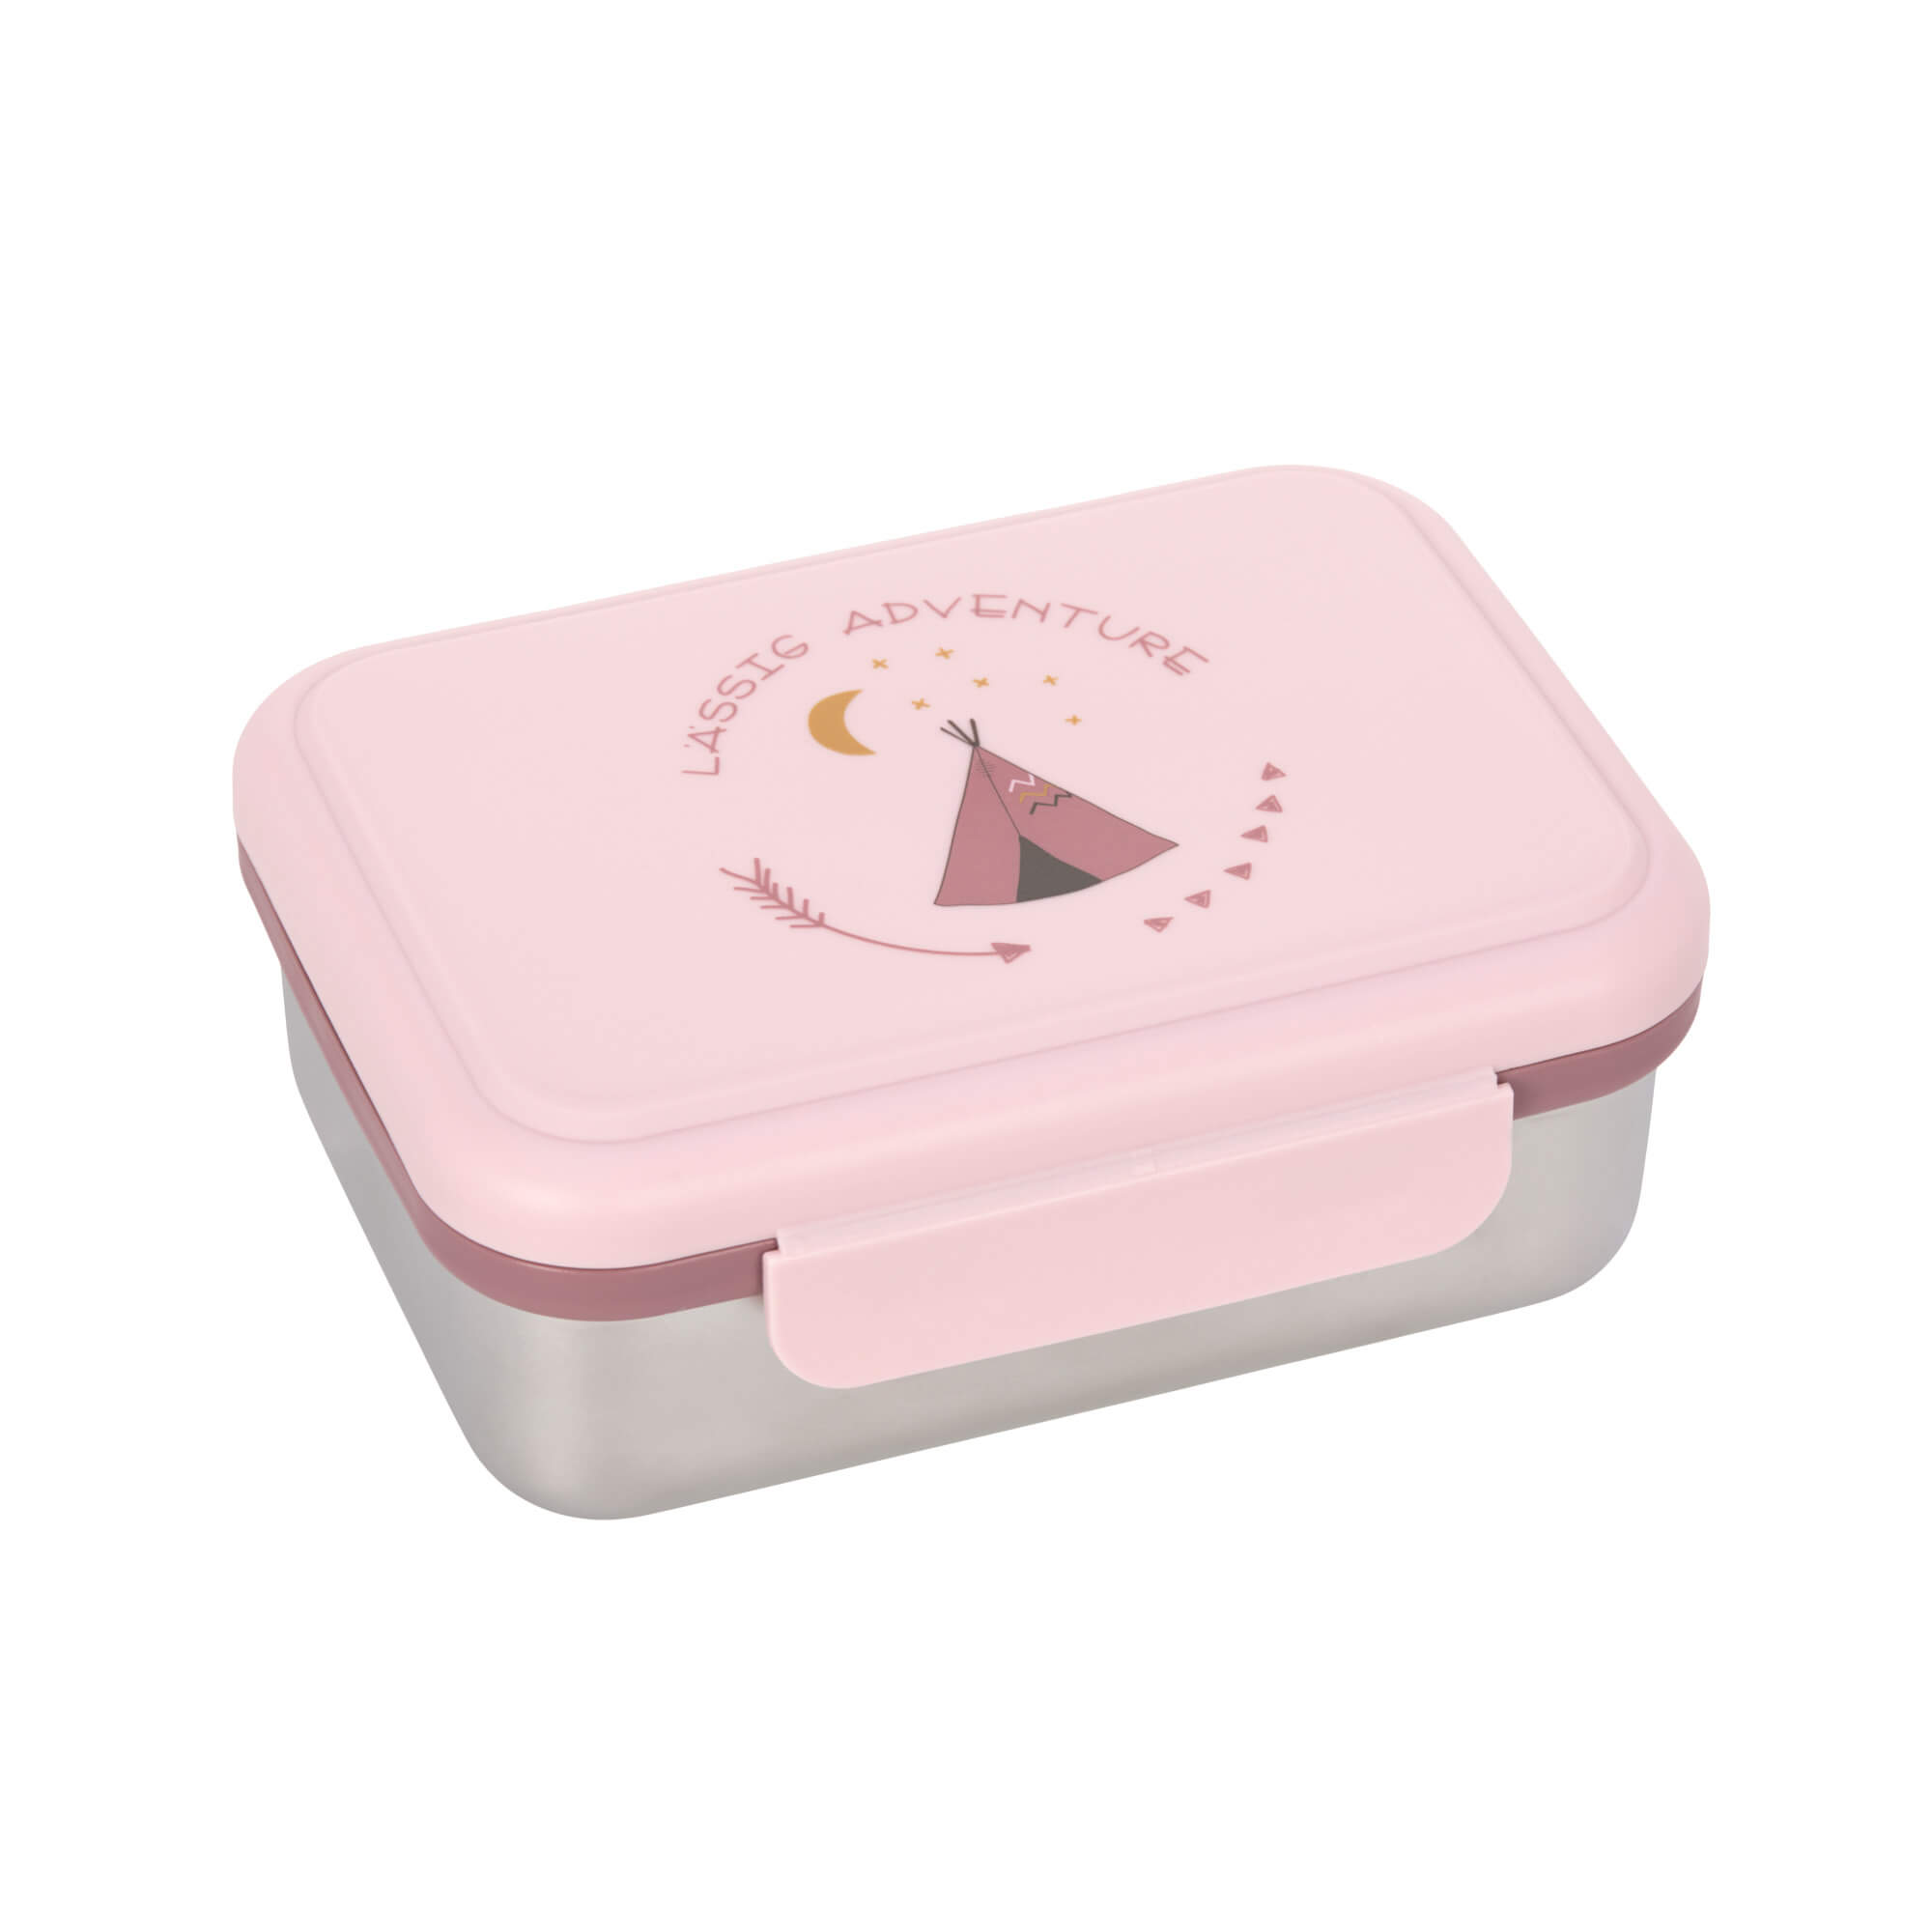 Lunchbox | Brotdose für Kinder - Edelstahl - Adventure Tipi - Lässig